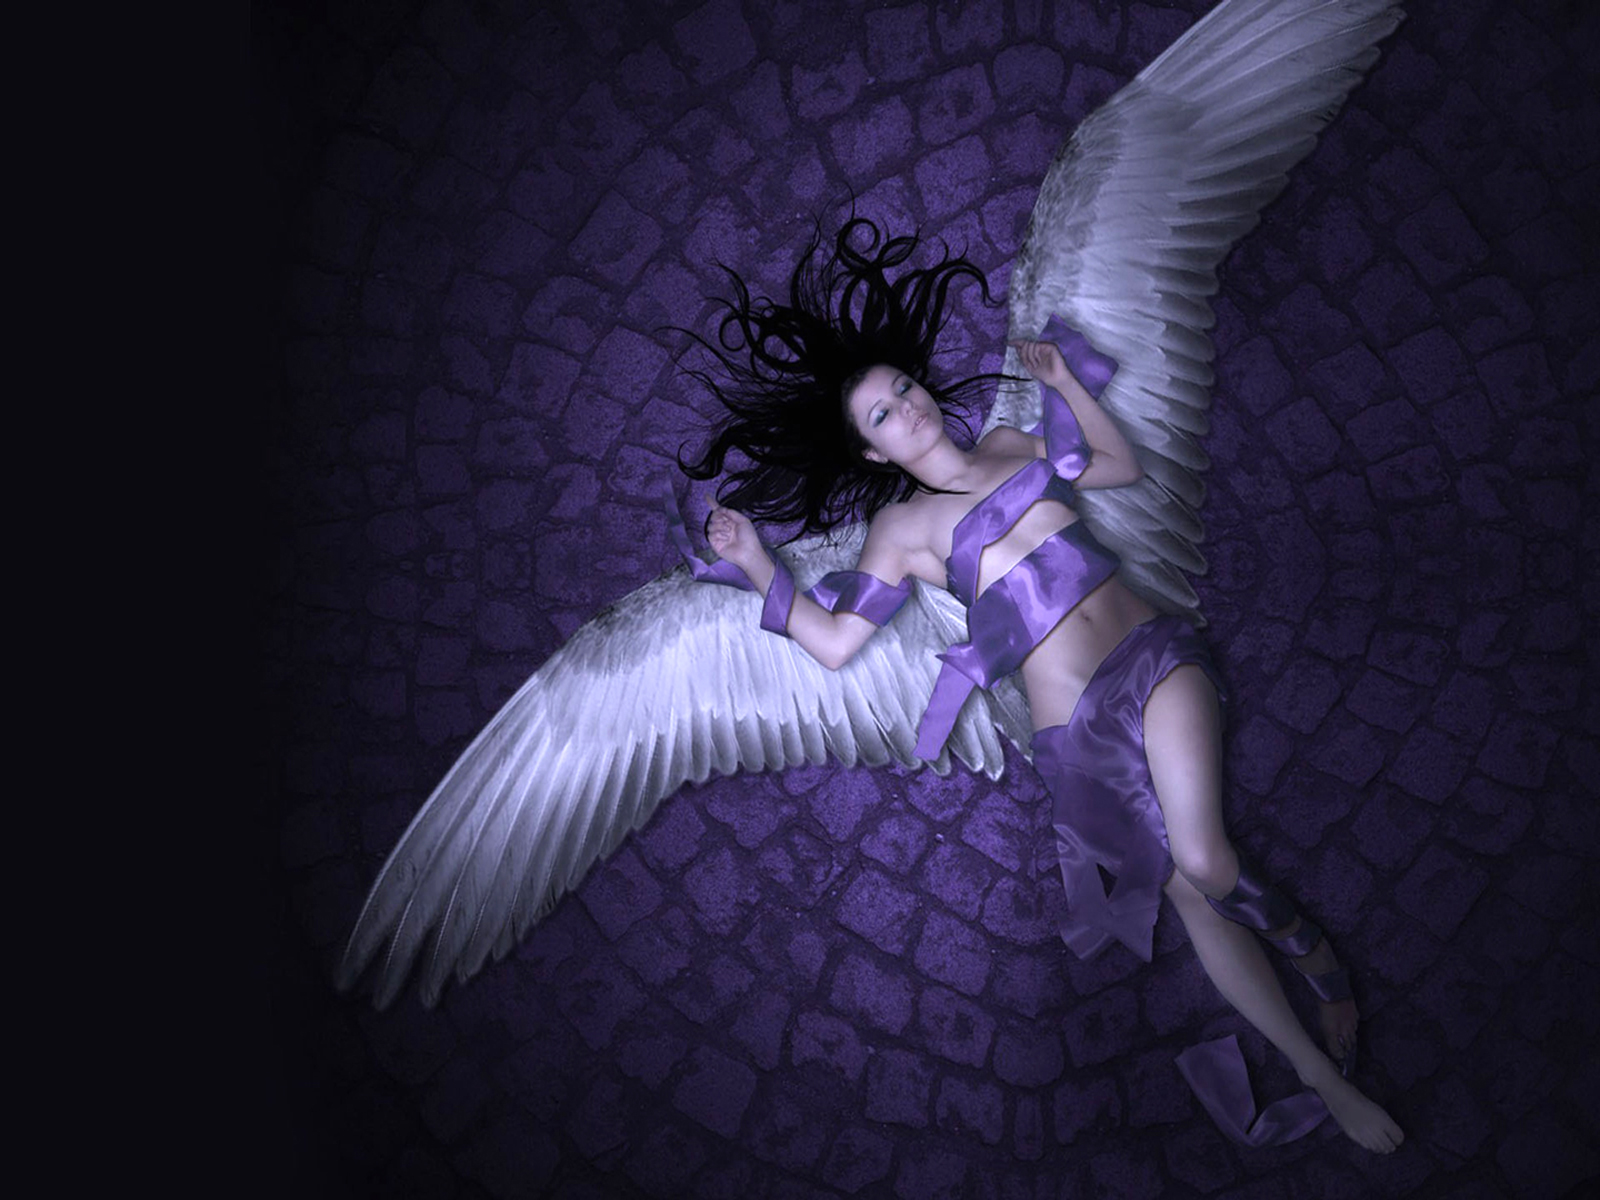 free download wallpapers angeles fantasy fallen angel hd 1600x1200